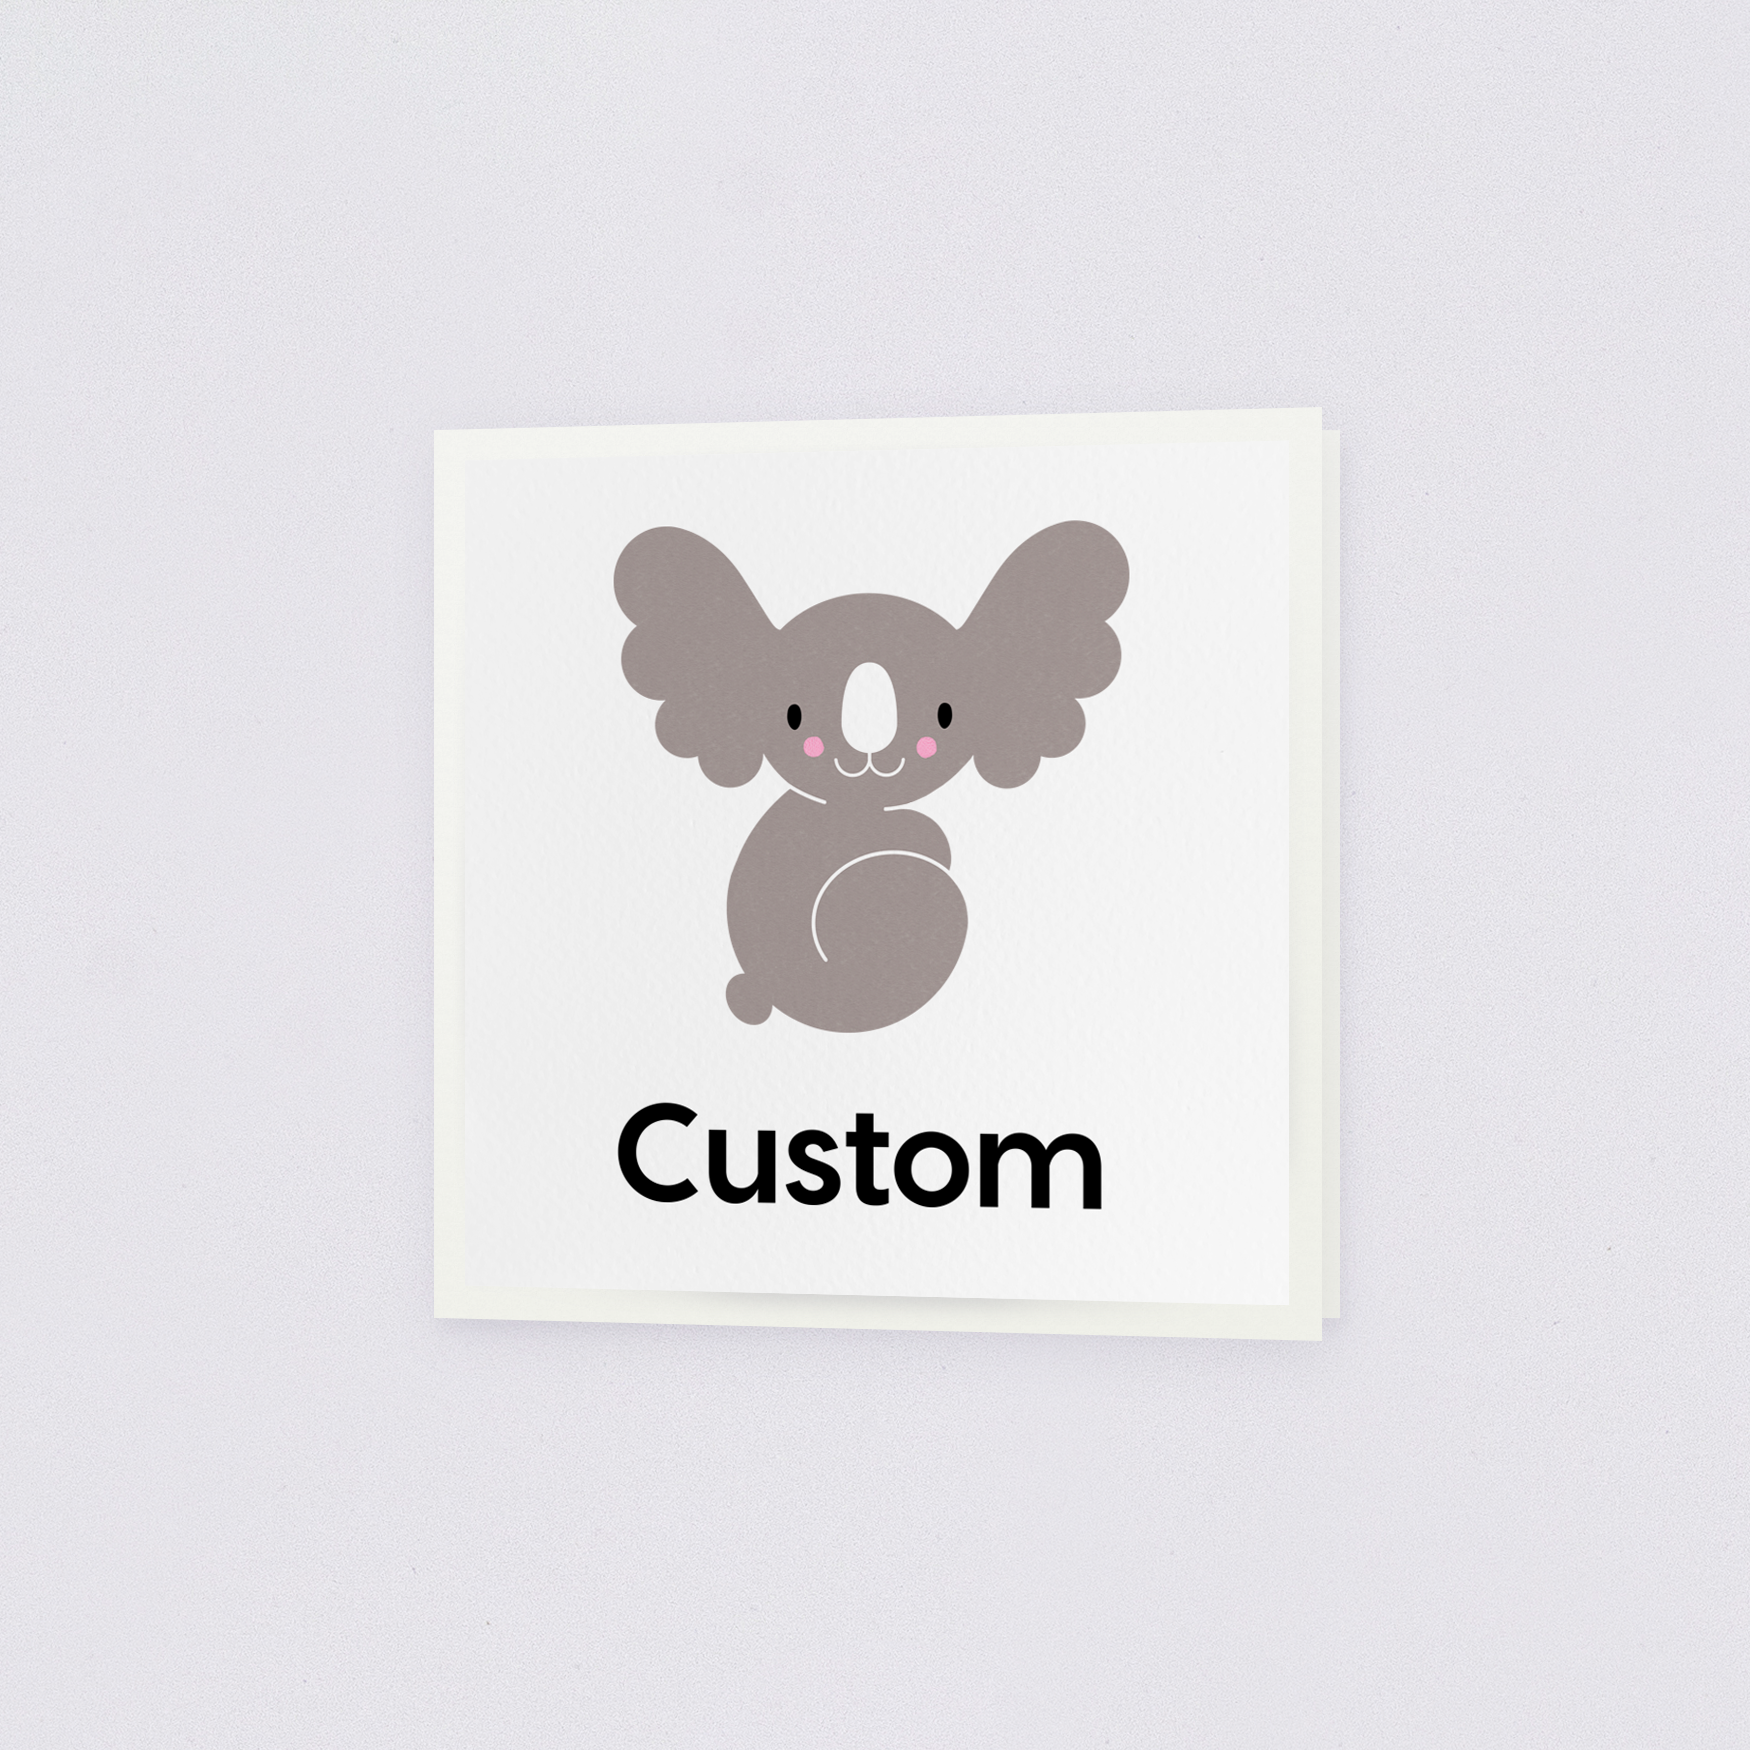 Custom - Cards (With detatchable archival mini prints)